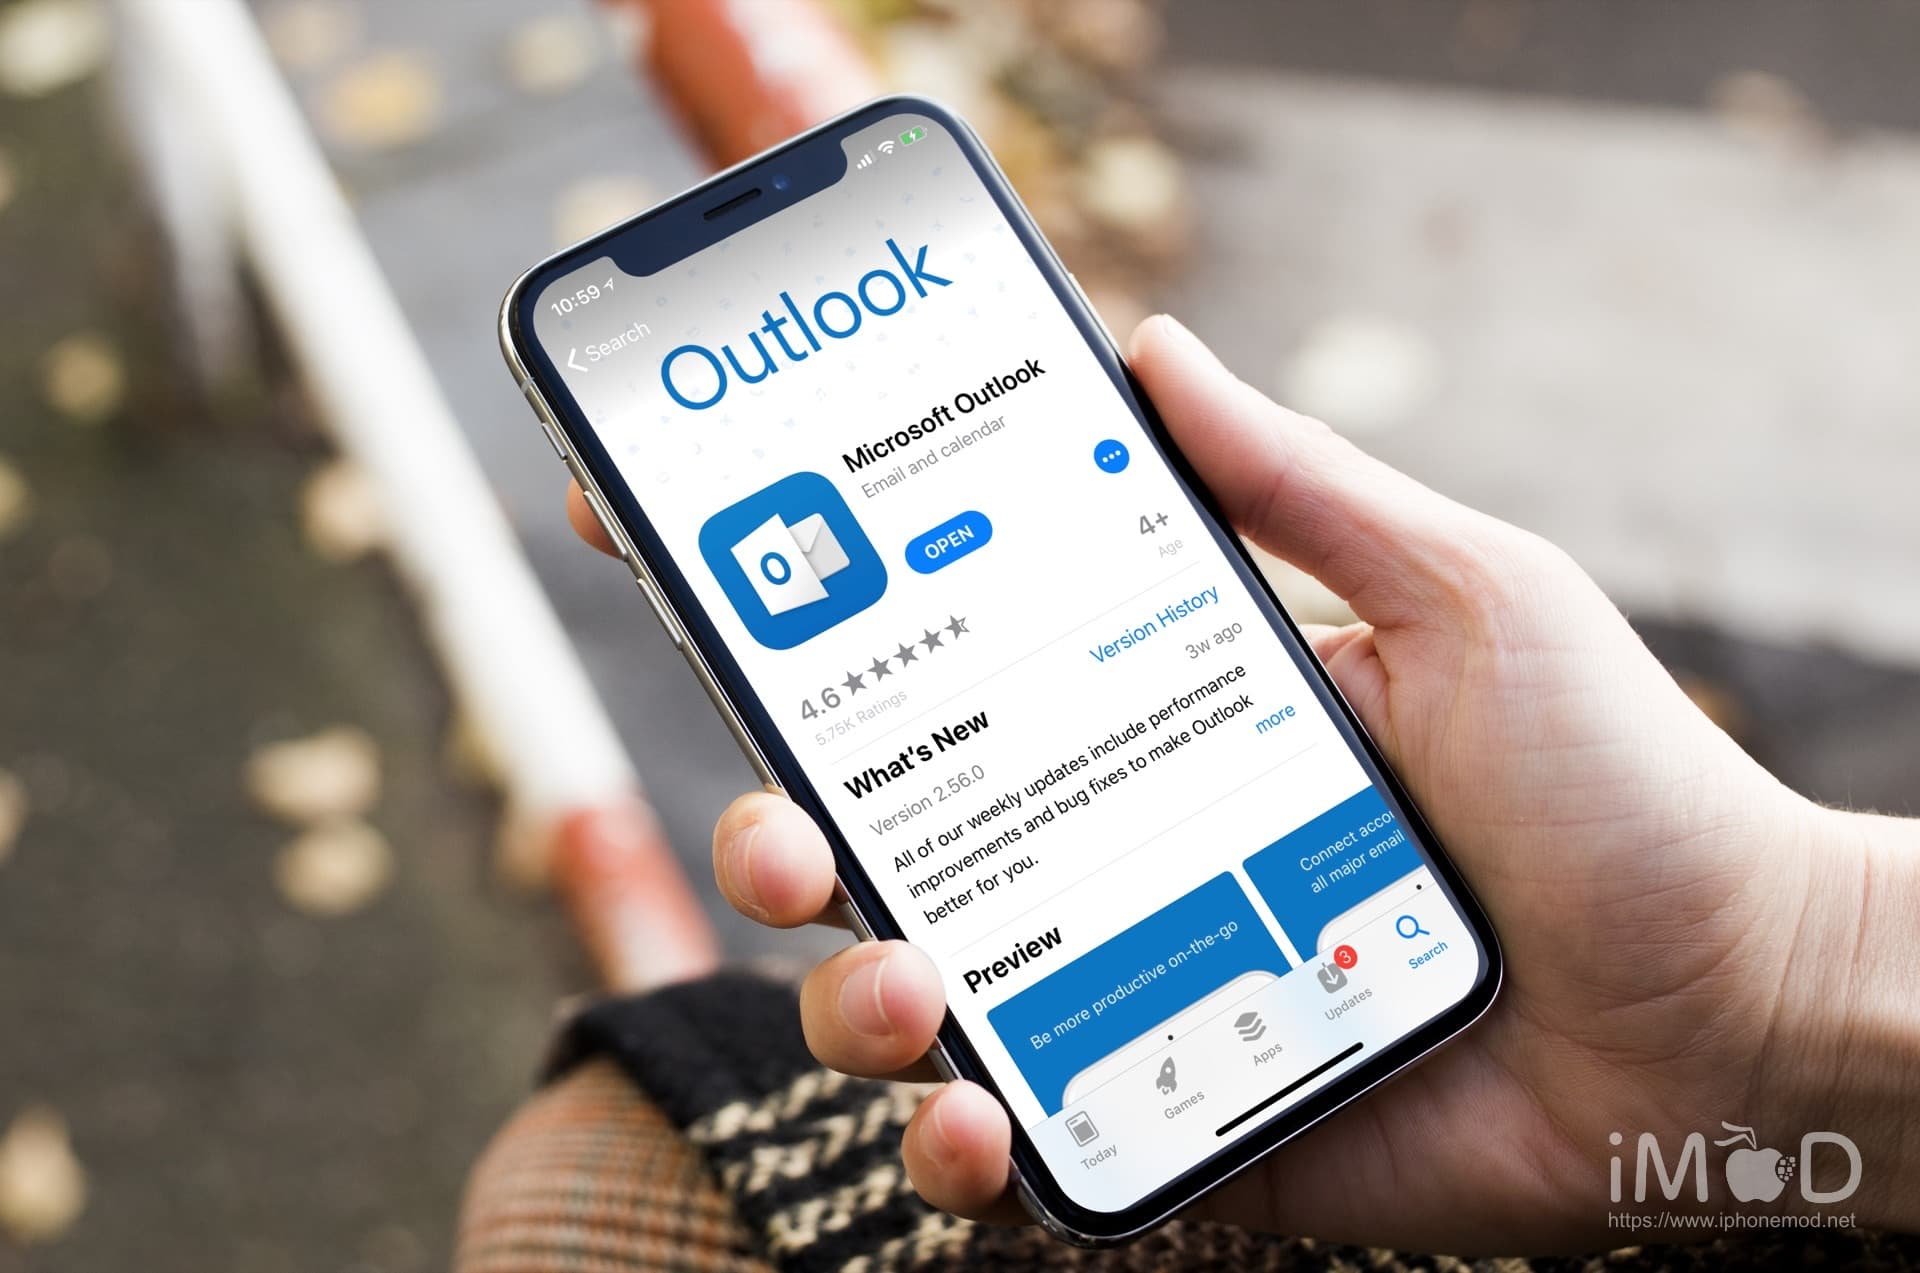 Microsoft Outlook Iphone X